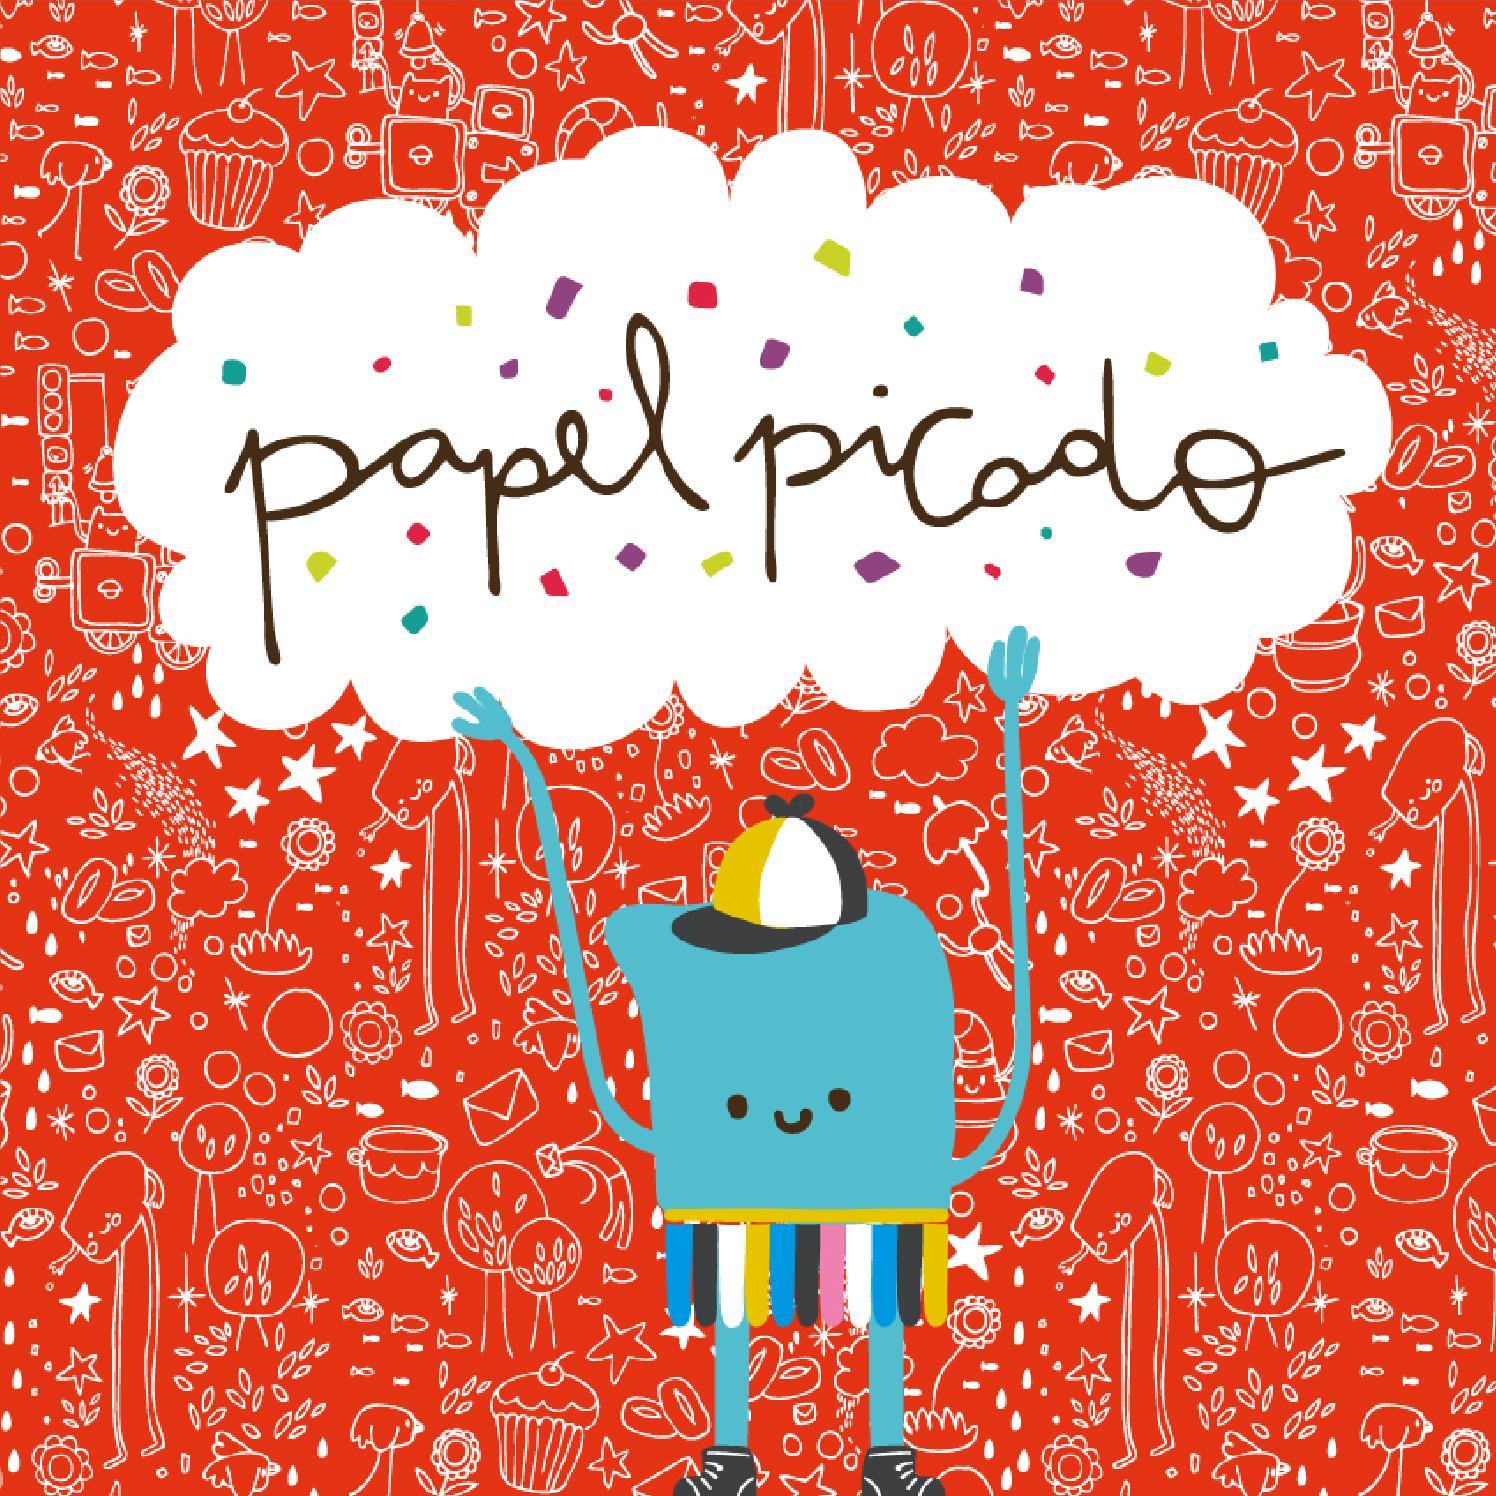 Catalogo Papel Picado by Papel Picado - issuu